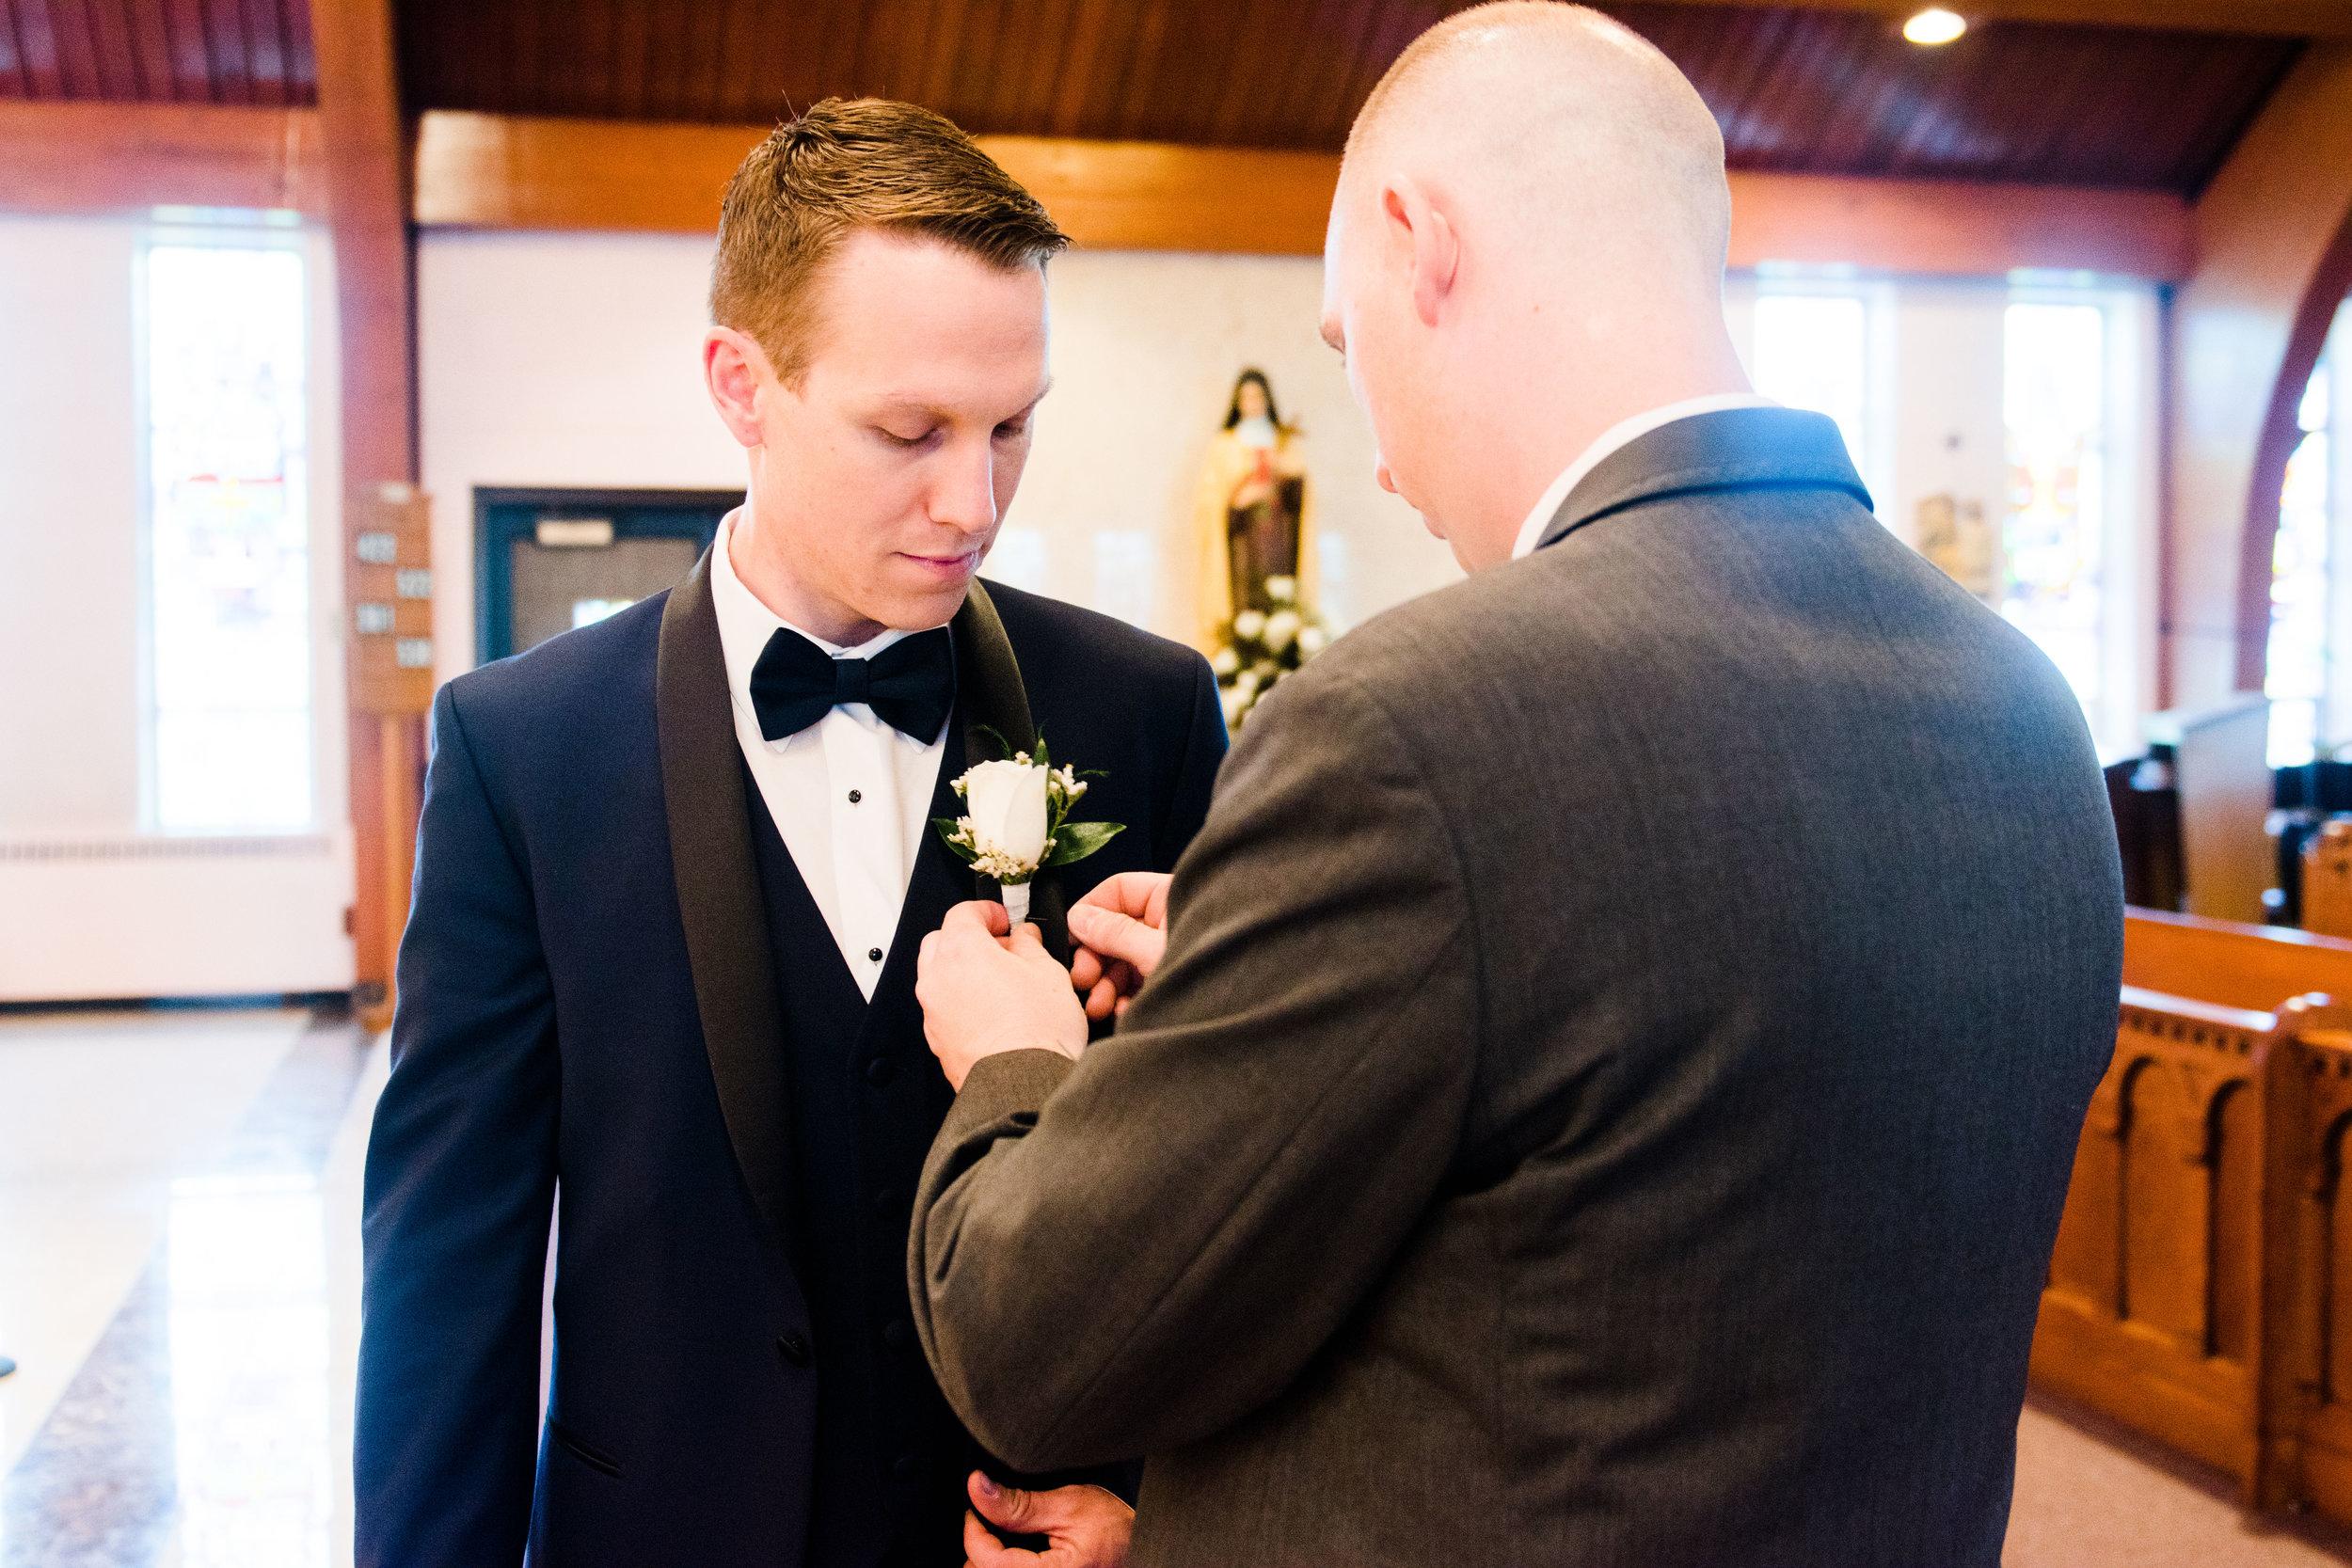 BENSALEM COUNTRY CLUB WEDDING PHOTOGRAPHY - 031EMILY SPONG.jpg